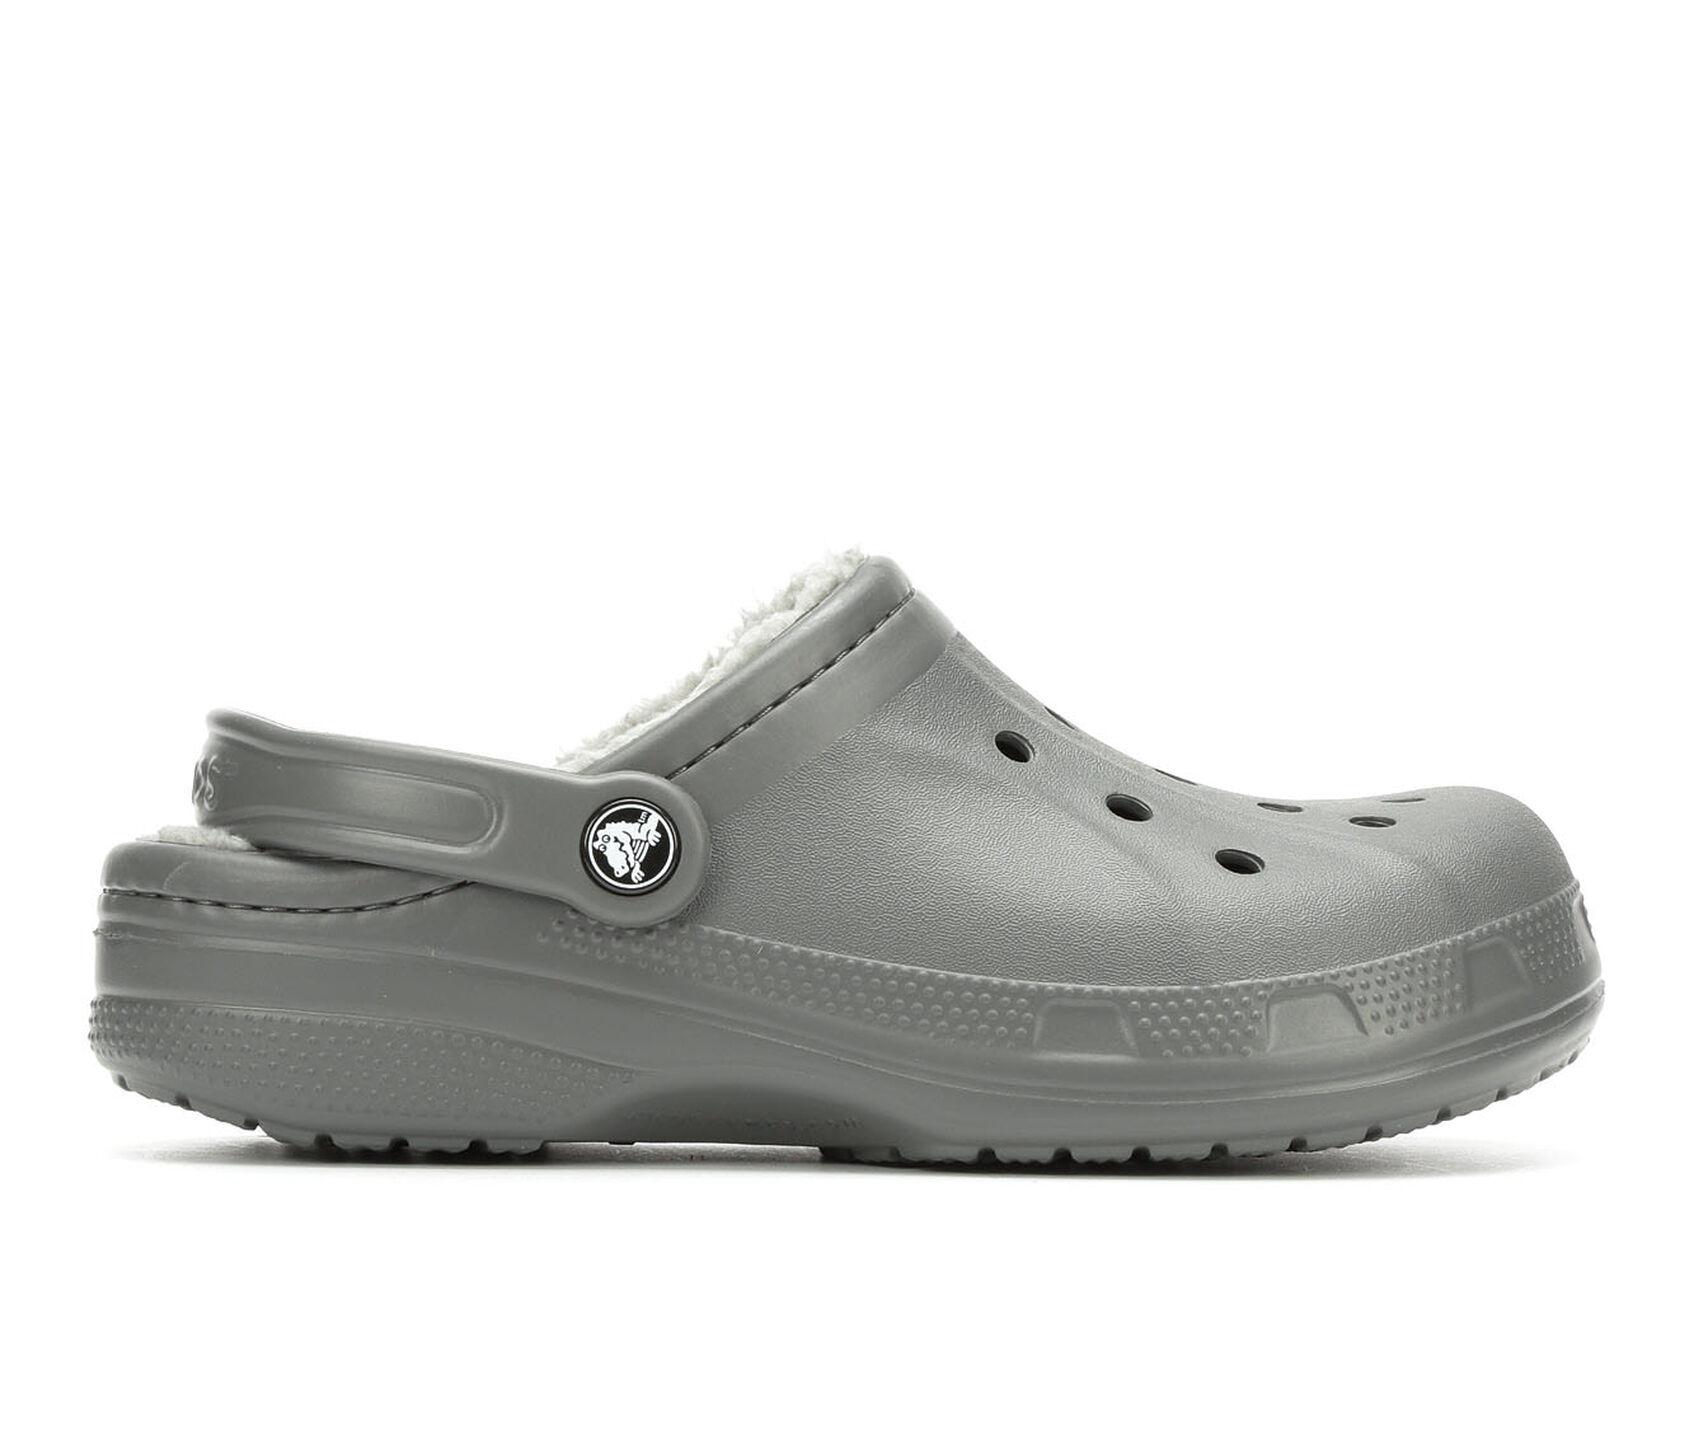 7779894c1 Adults  Crocs Winter Clog